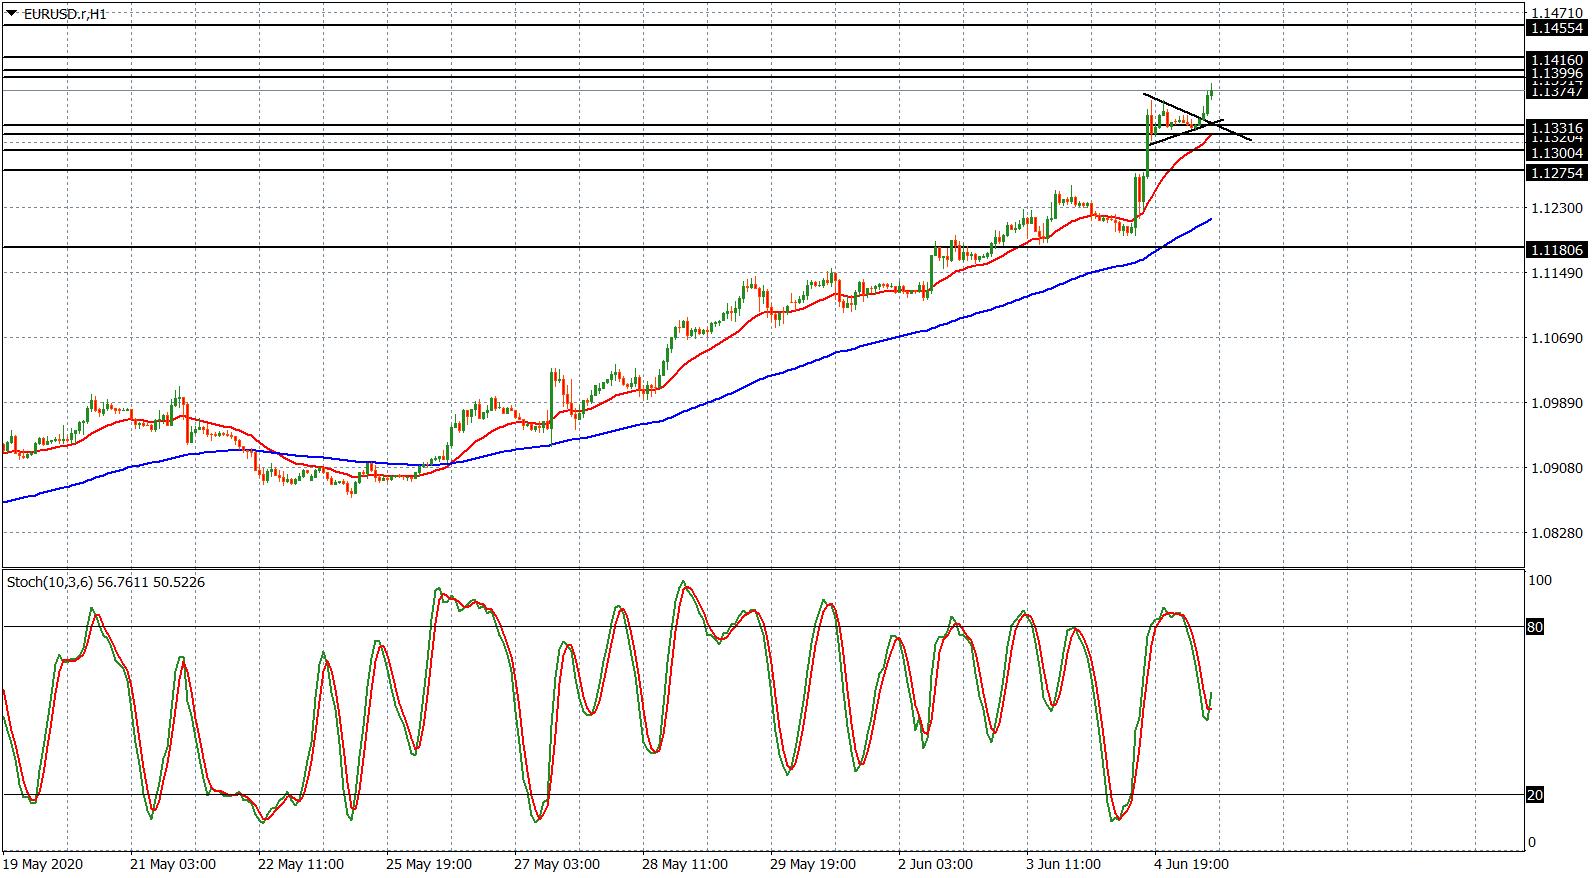 EUR/USD - grafico h1